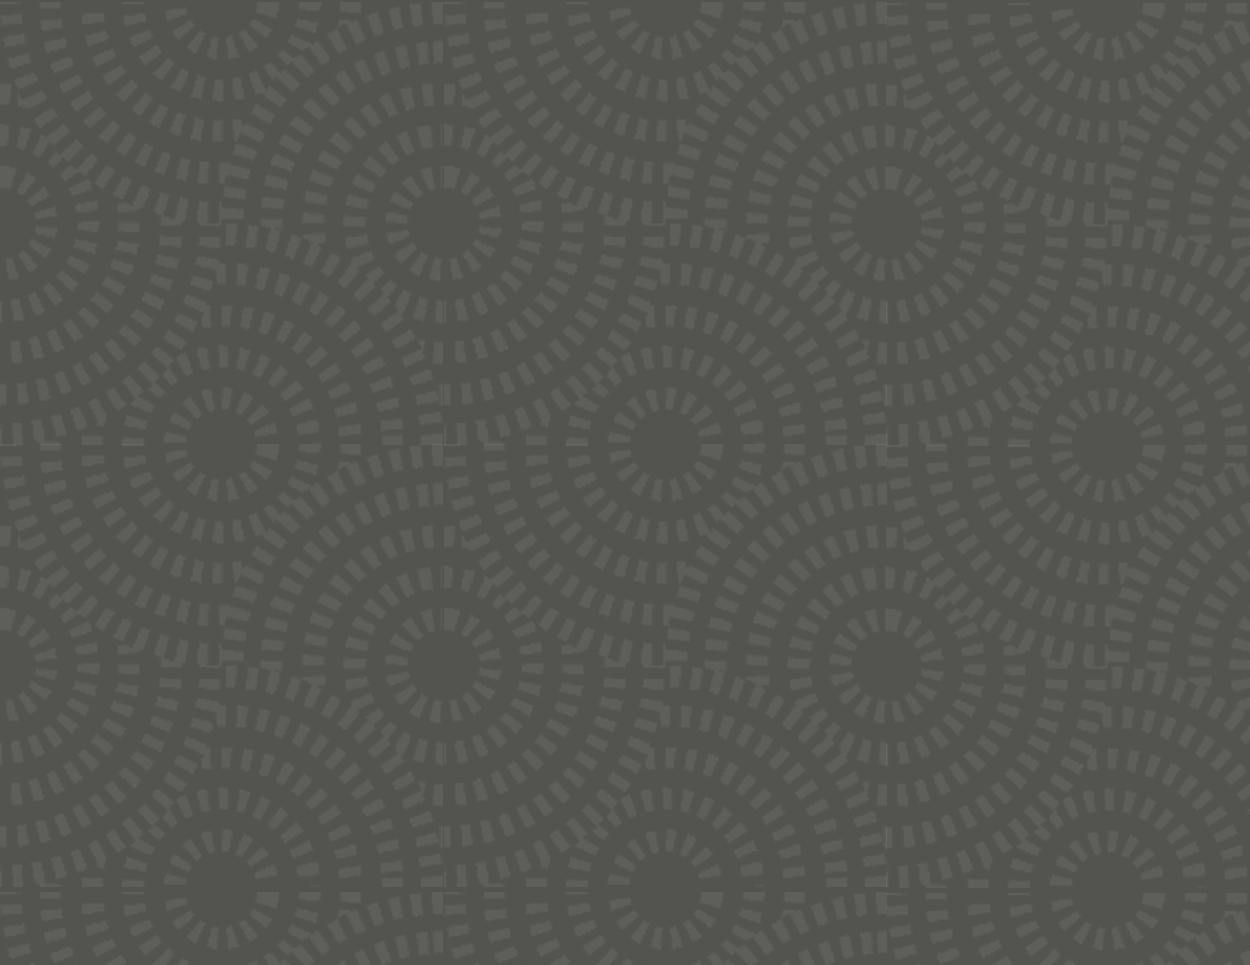 swirls gray background